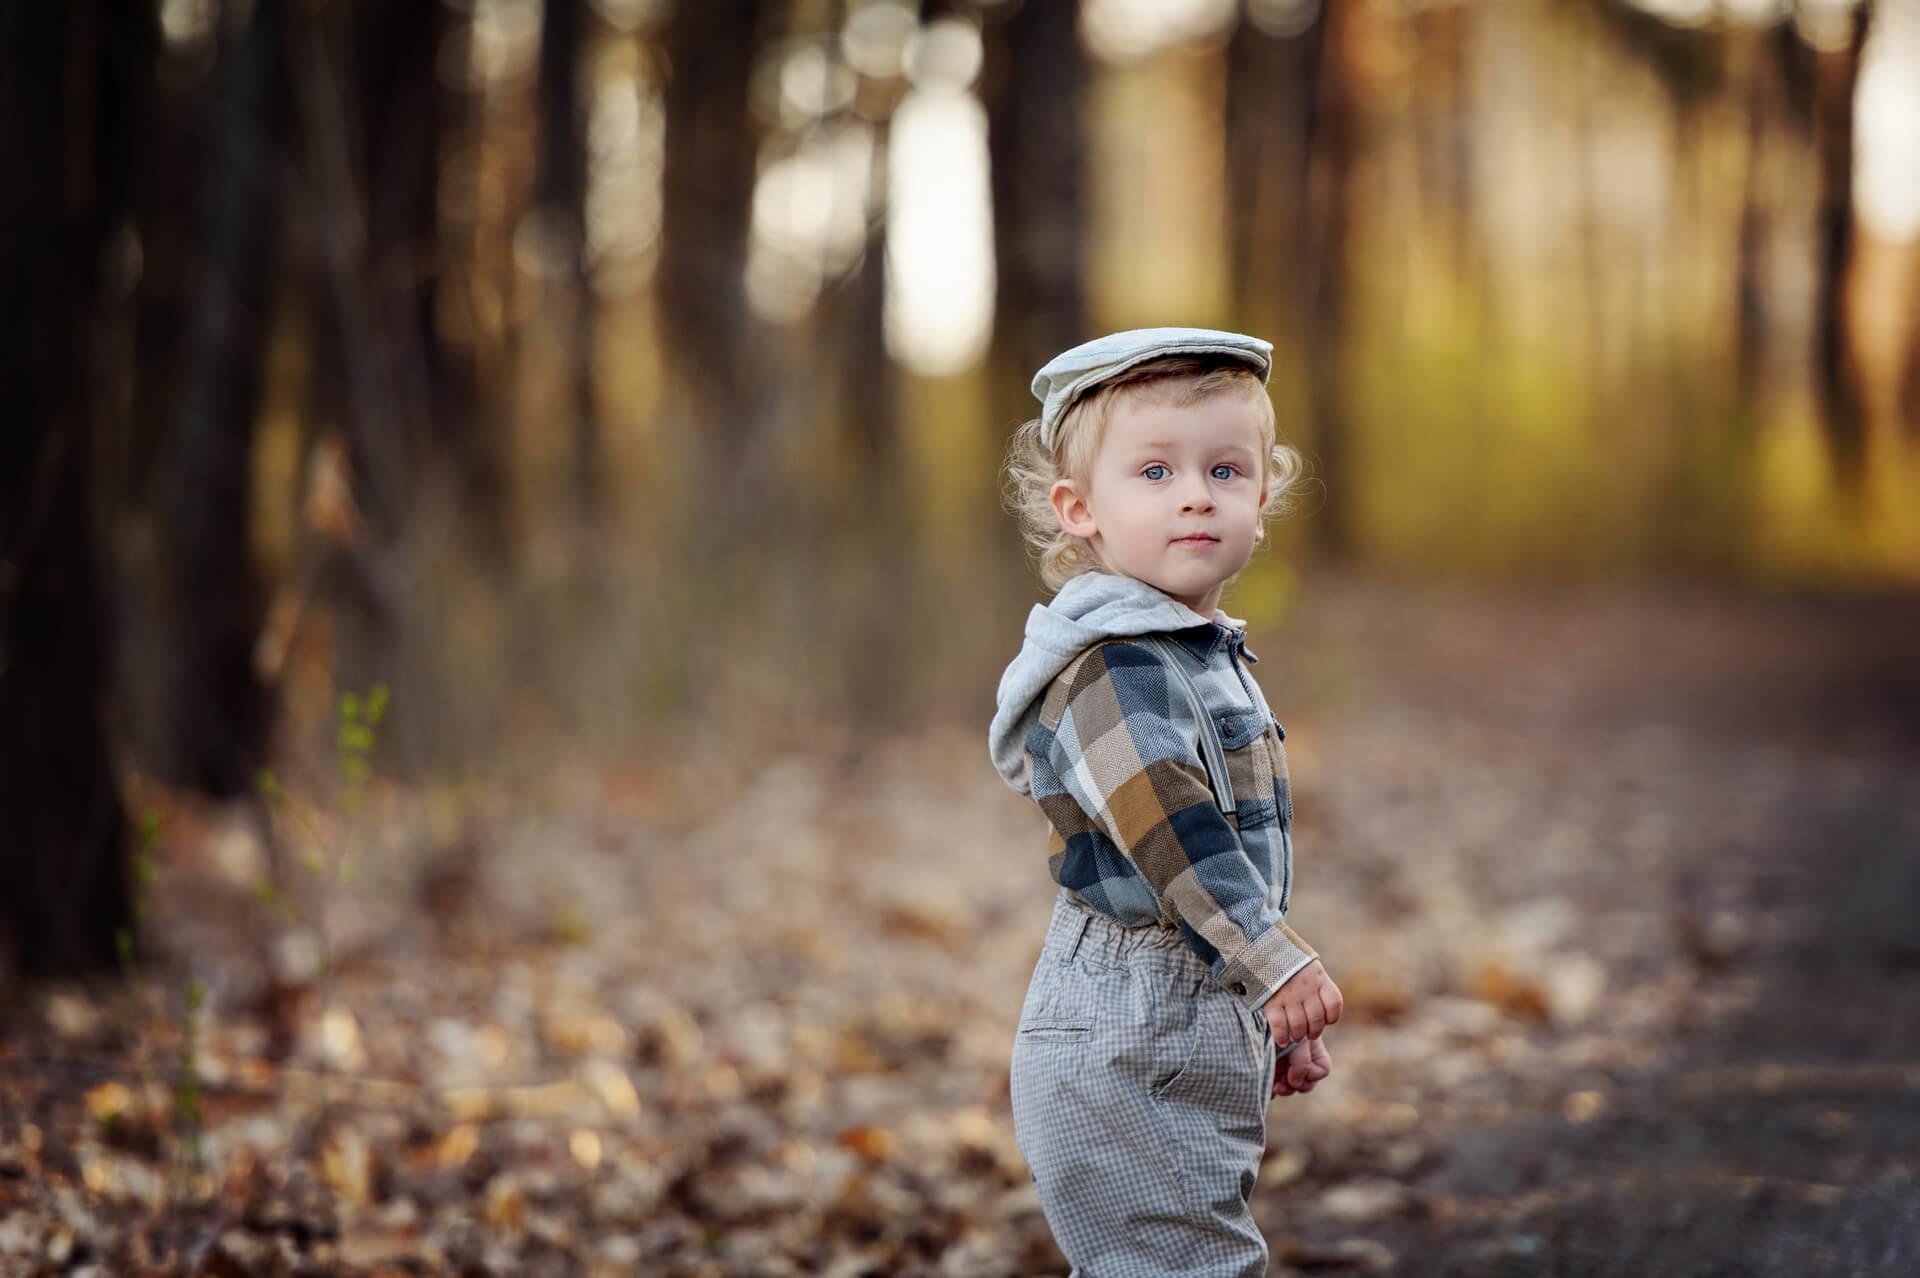 profesionalny fotograf Peter Norulak Kosice umelecke fotky deti exterier priroda jesen_05